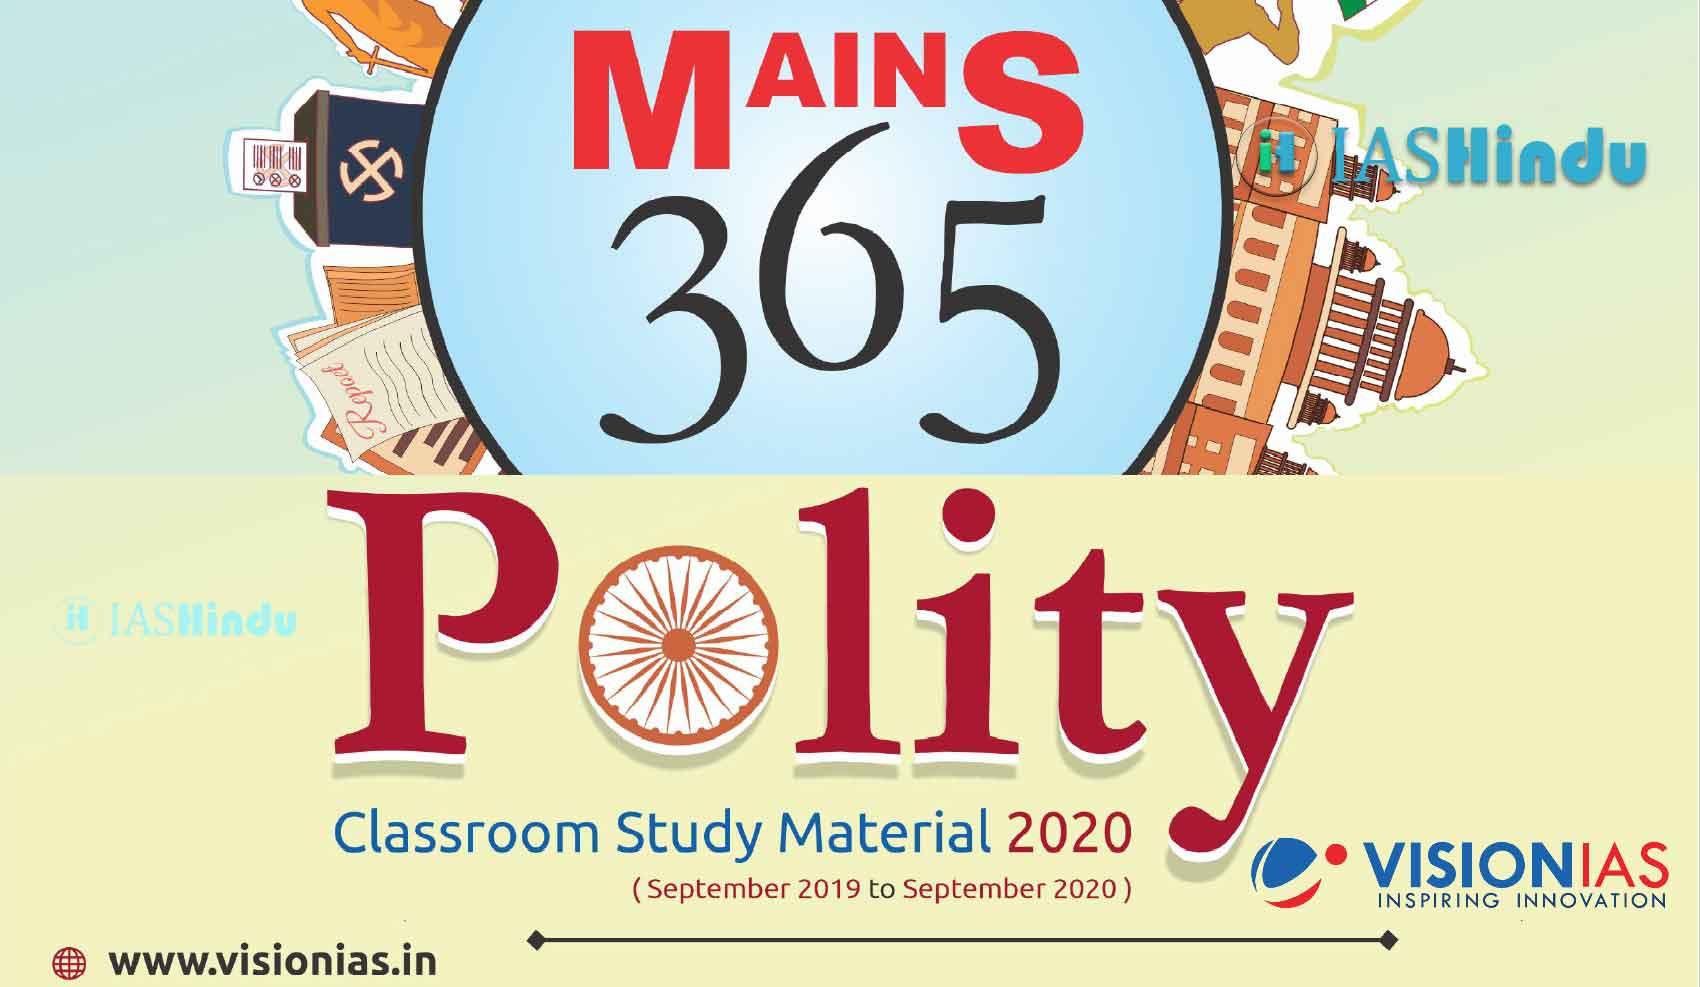 Vision IAS Mains 365 Polity 2020